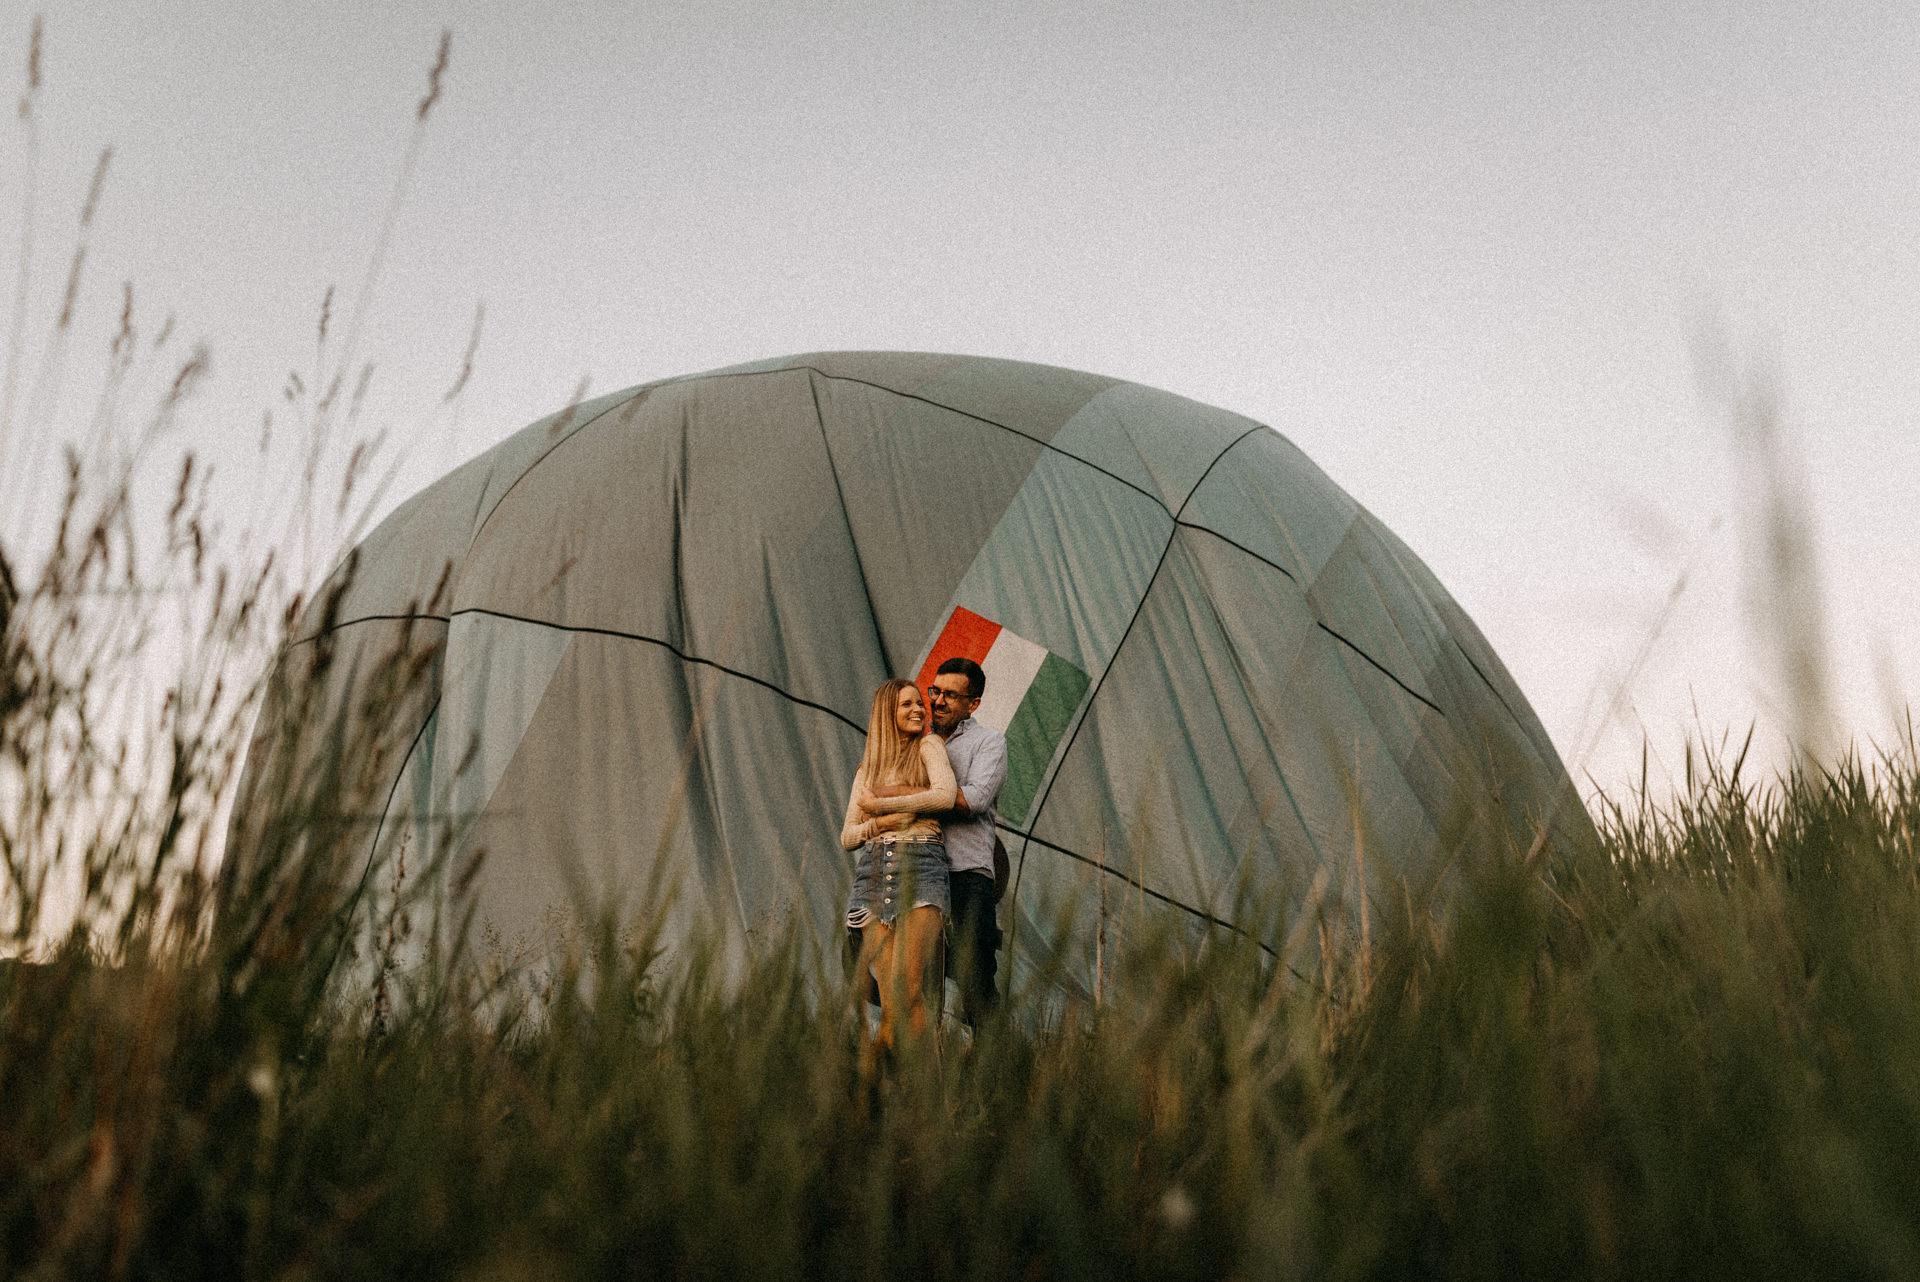 holegballon jegyes fotozas air baloon engagement session